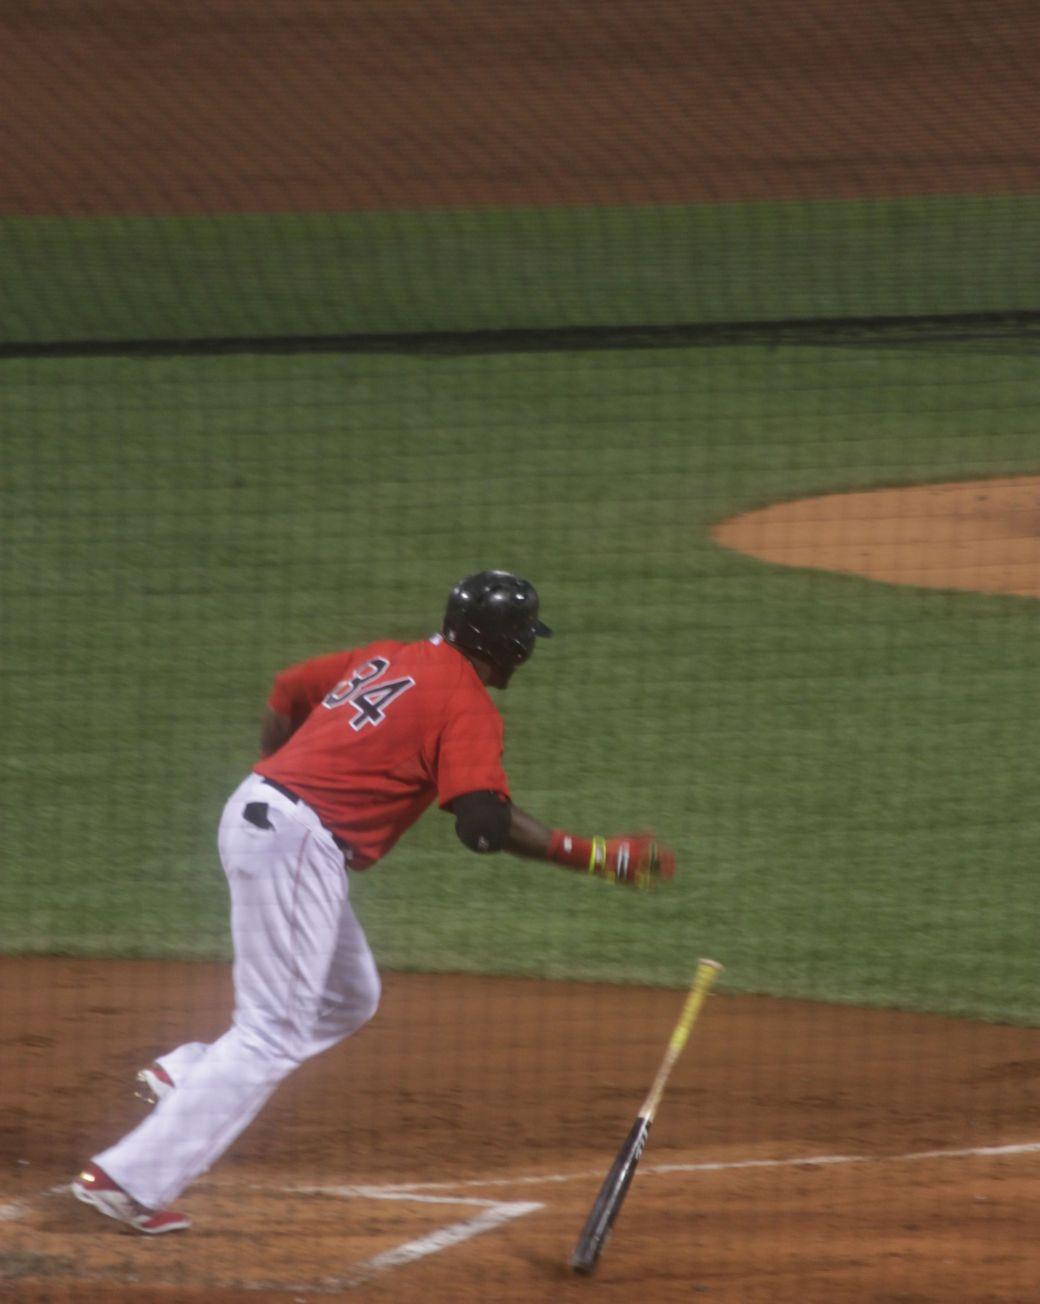 boston red sox fenway park game against yankees august 1 2014 david ortiz big papi 3